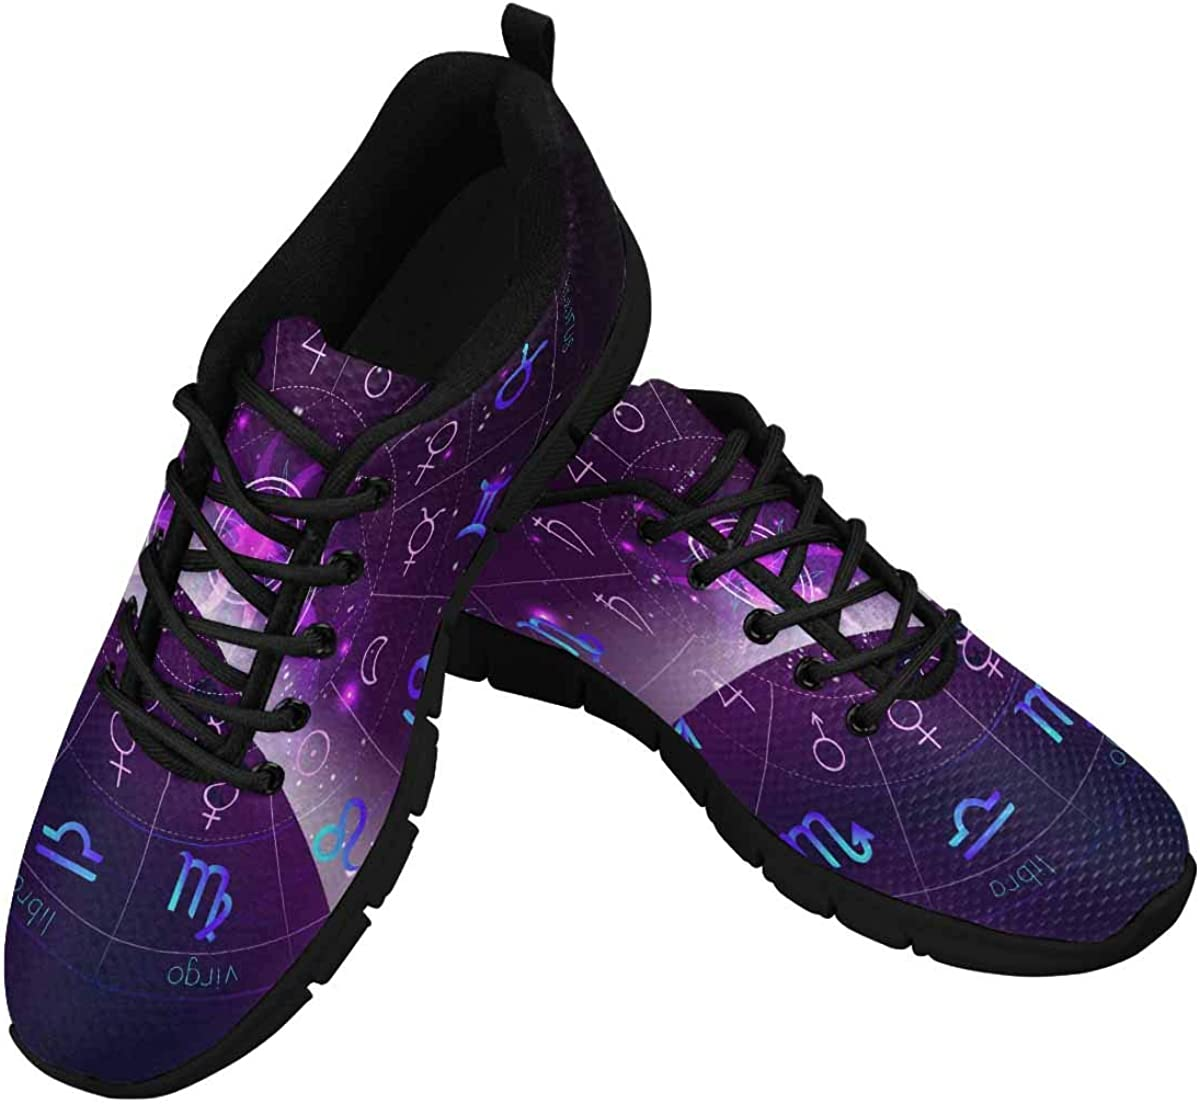 InterestPrint Horoscope Circle, Zodiac Signs Women's Breathable Sneaker